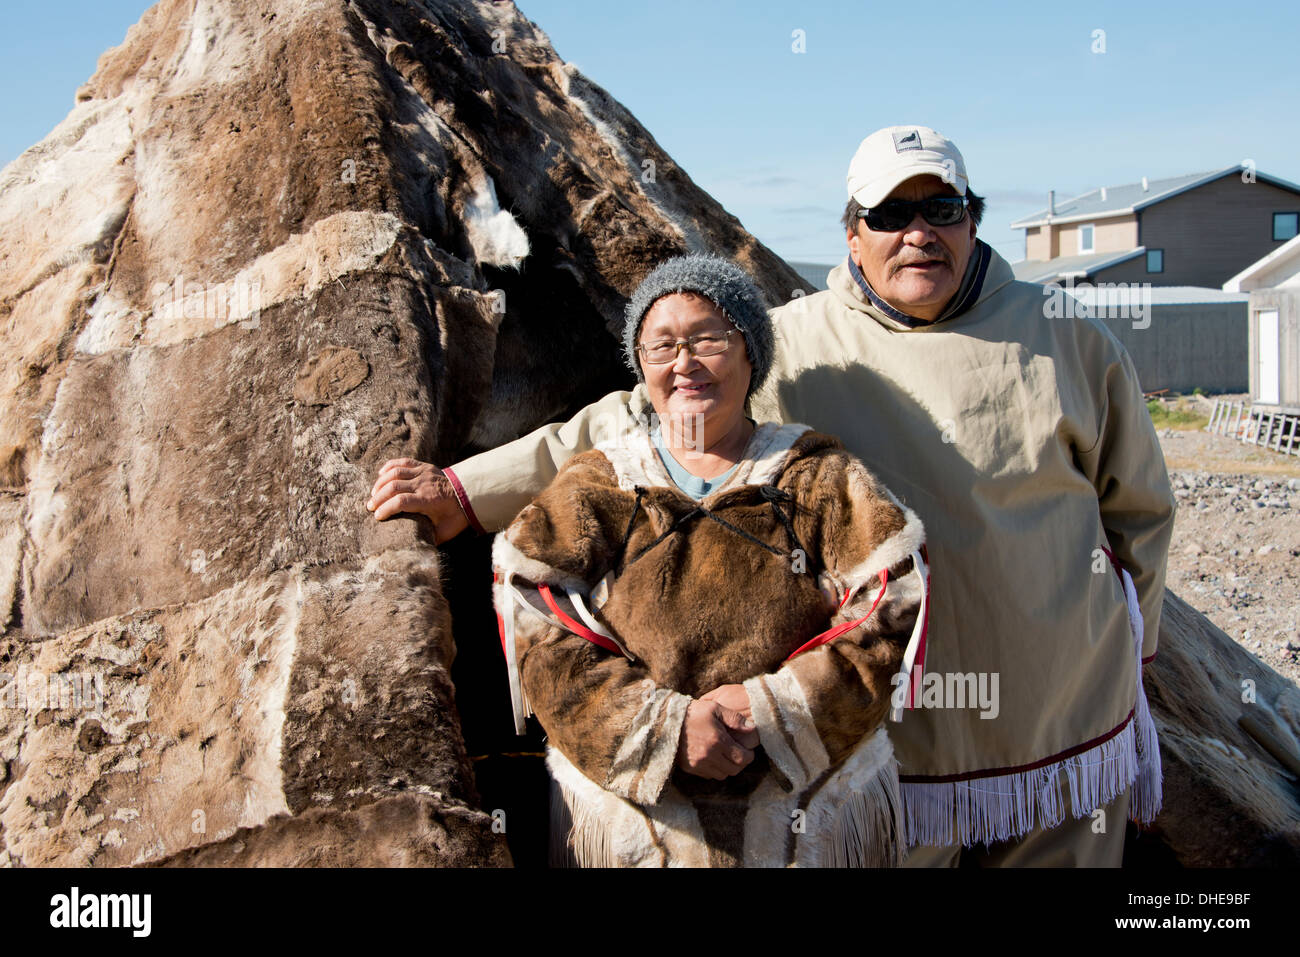 Canada, Nunavut, western shore of Hudson Bay, Kivalliq Region, Arviat. Inuit couple (Mary & Peter) in traditional arctic attire. - Stock Image